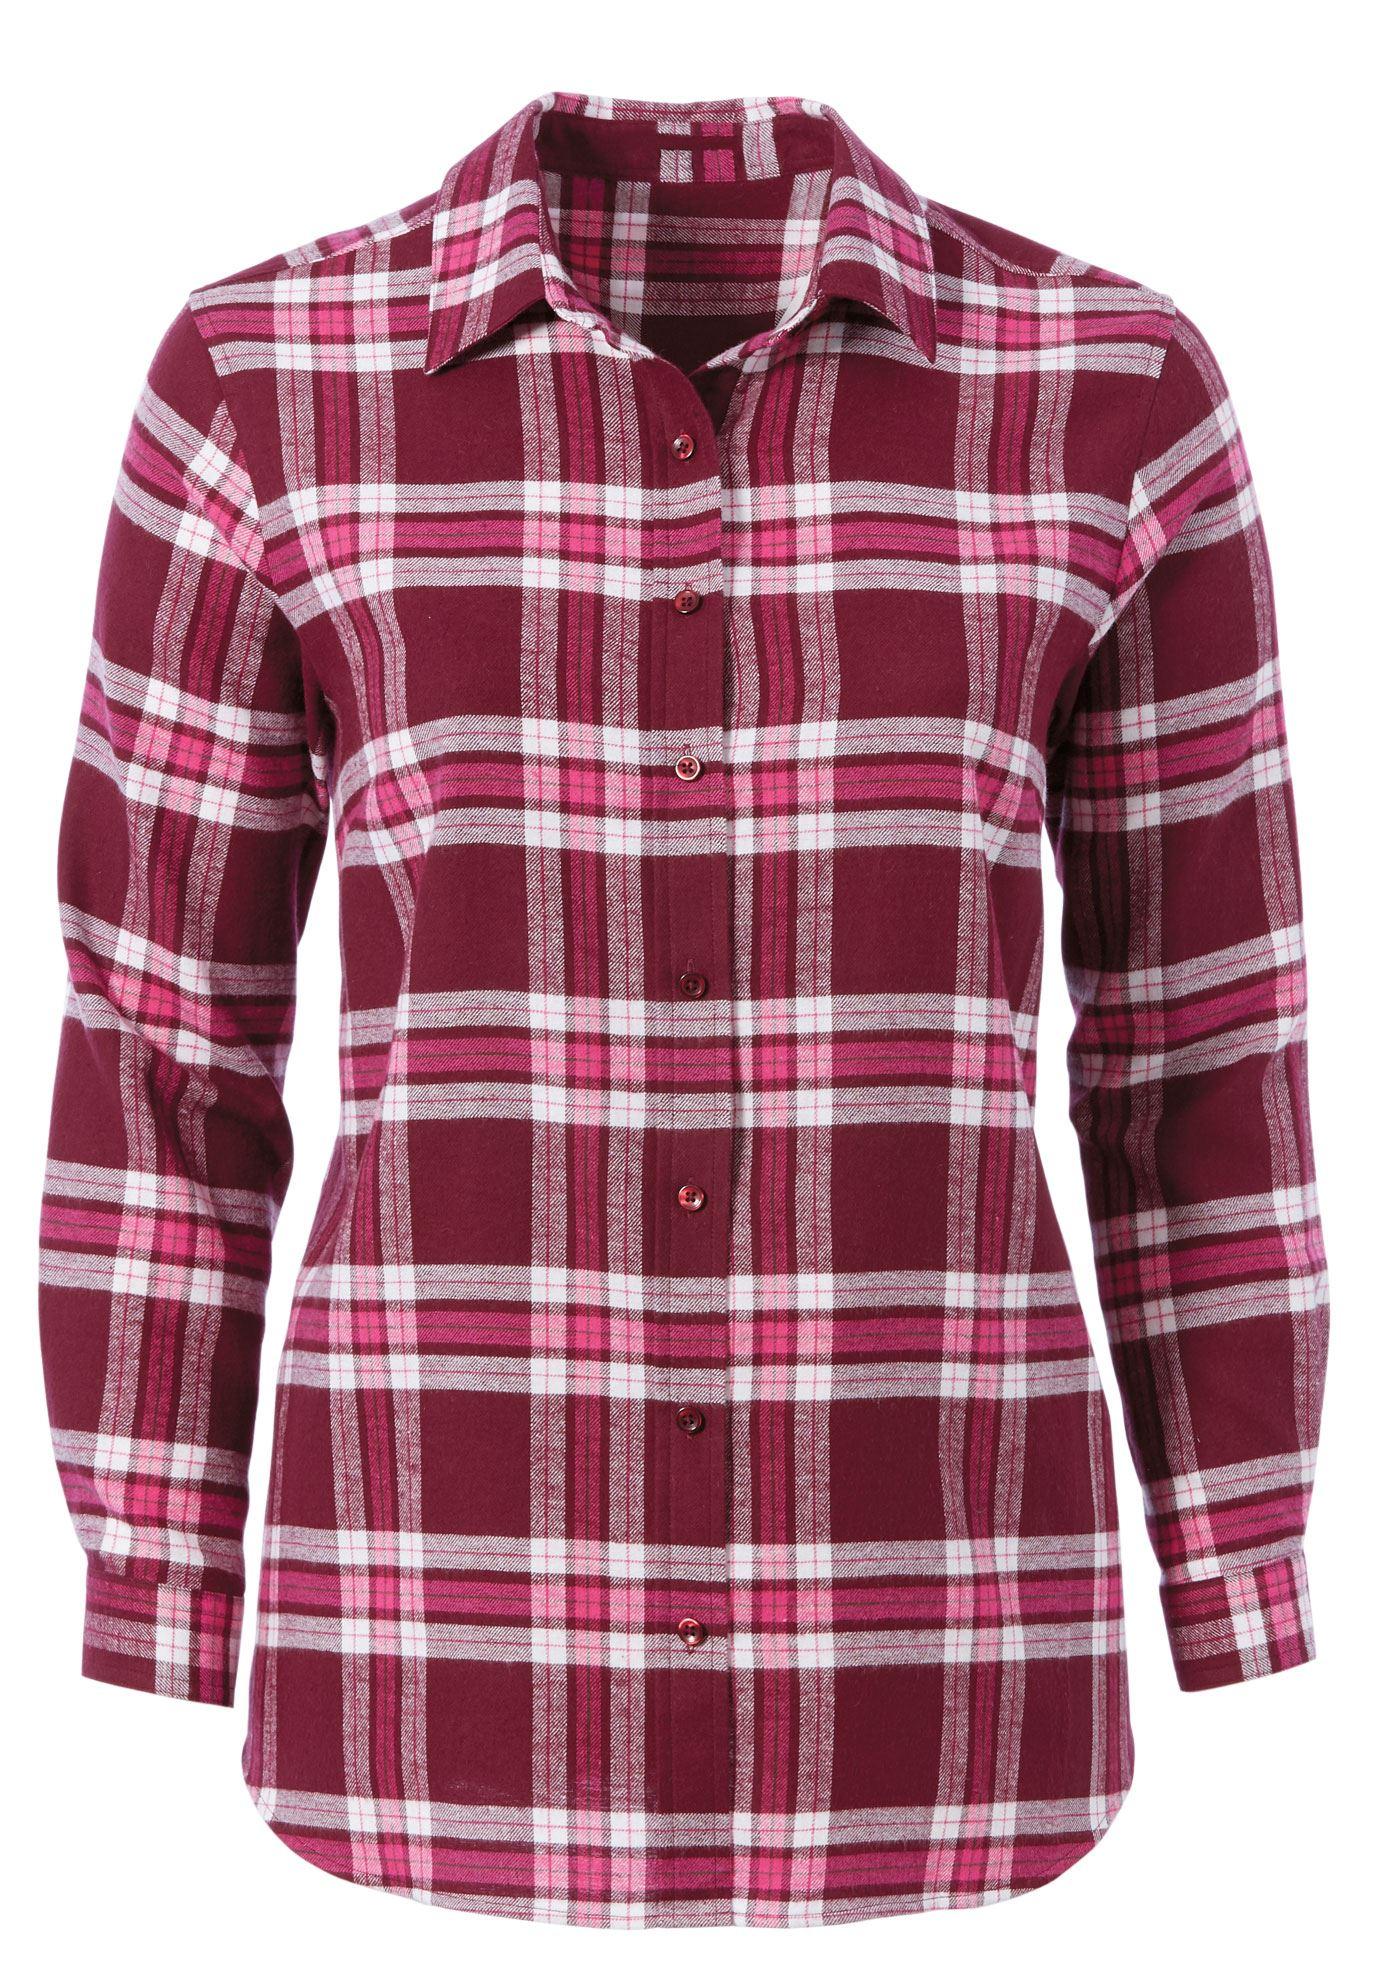 Flannel shirt plus size  Plaid Flannel Shirt by ellos  Womenus Plus Size Clothing  Products